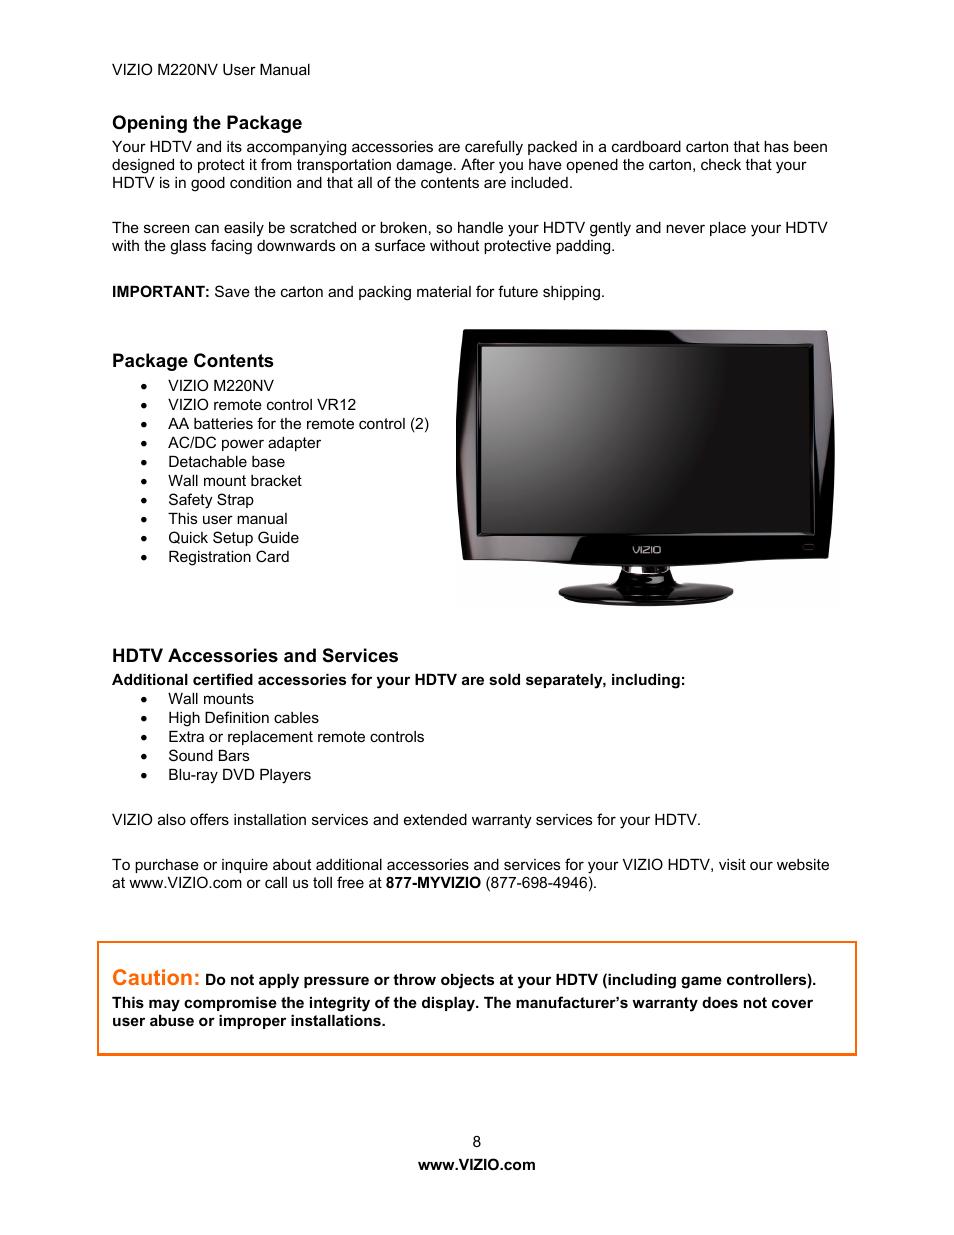 Caution | Vizio M220NV User Manual | Page 8 / 58 | Original mode